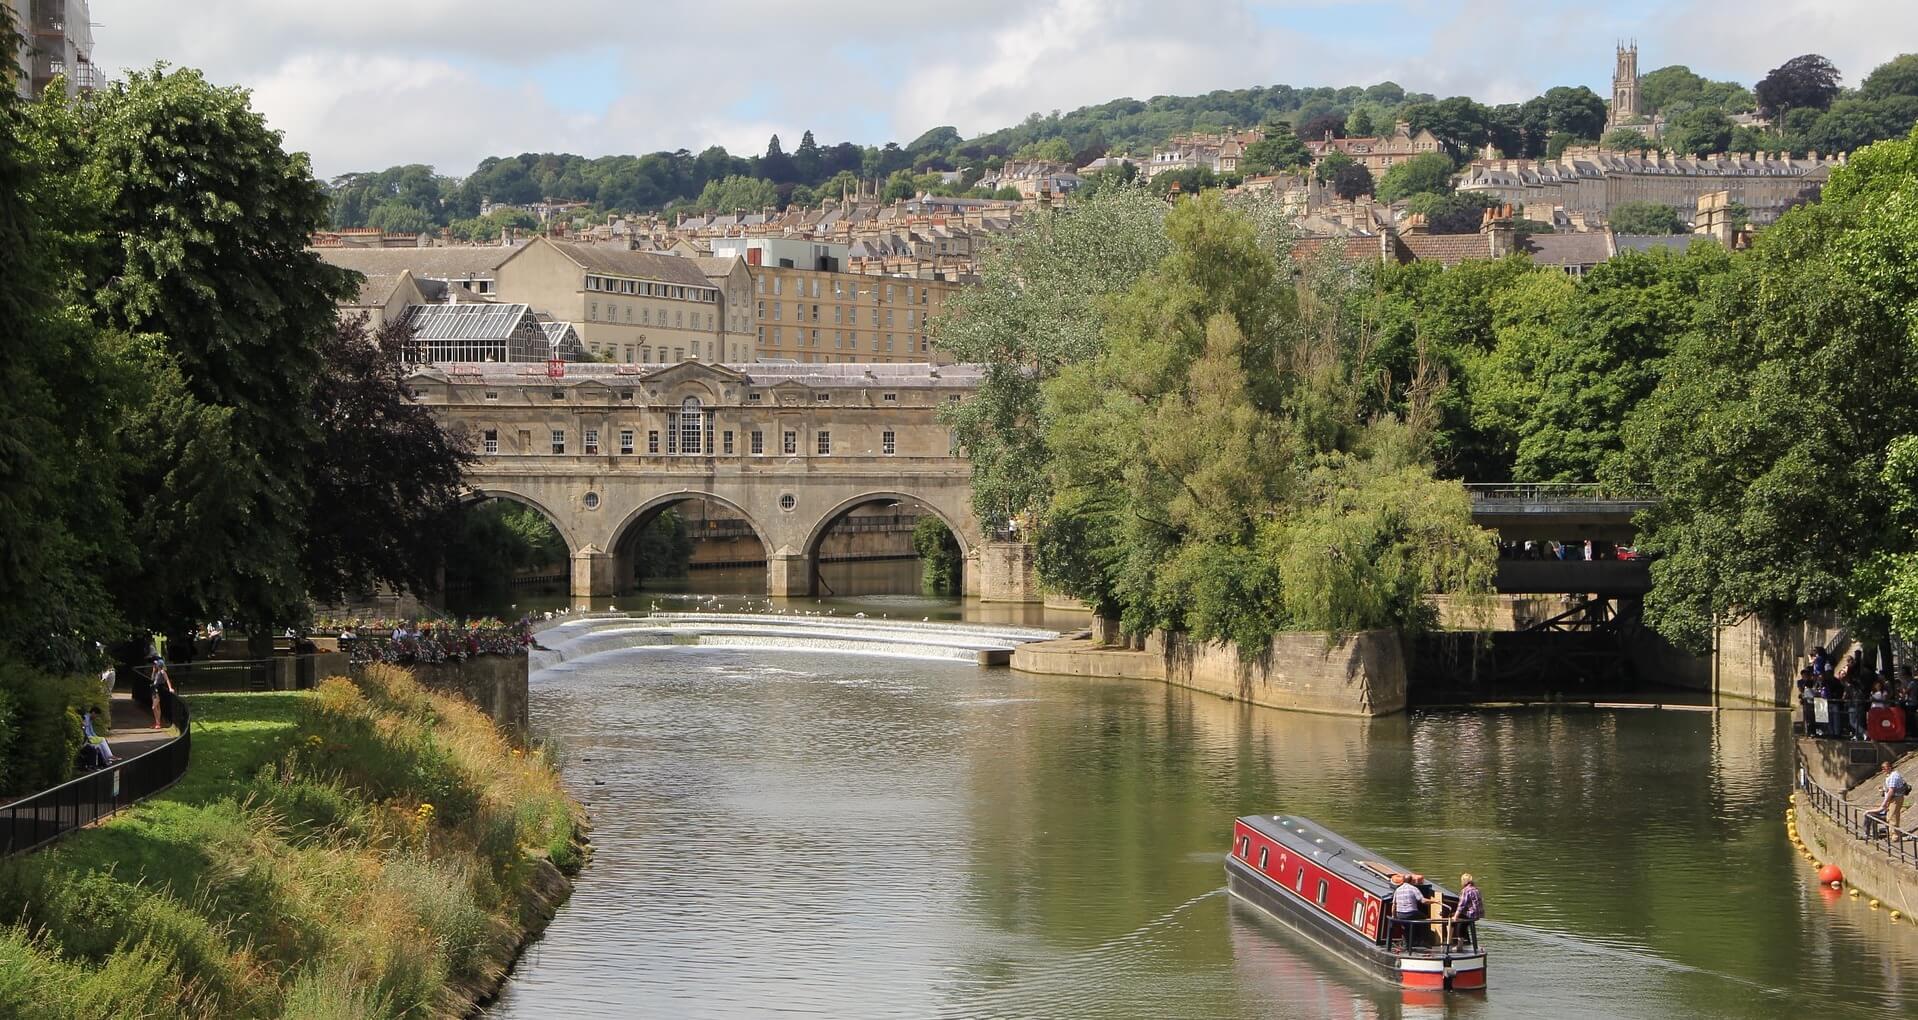 Self Catering Properties in Bath